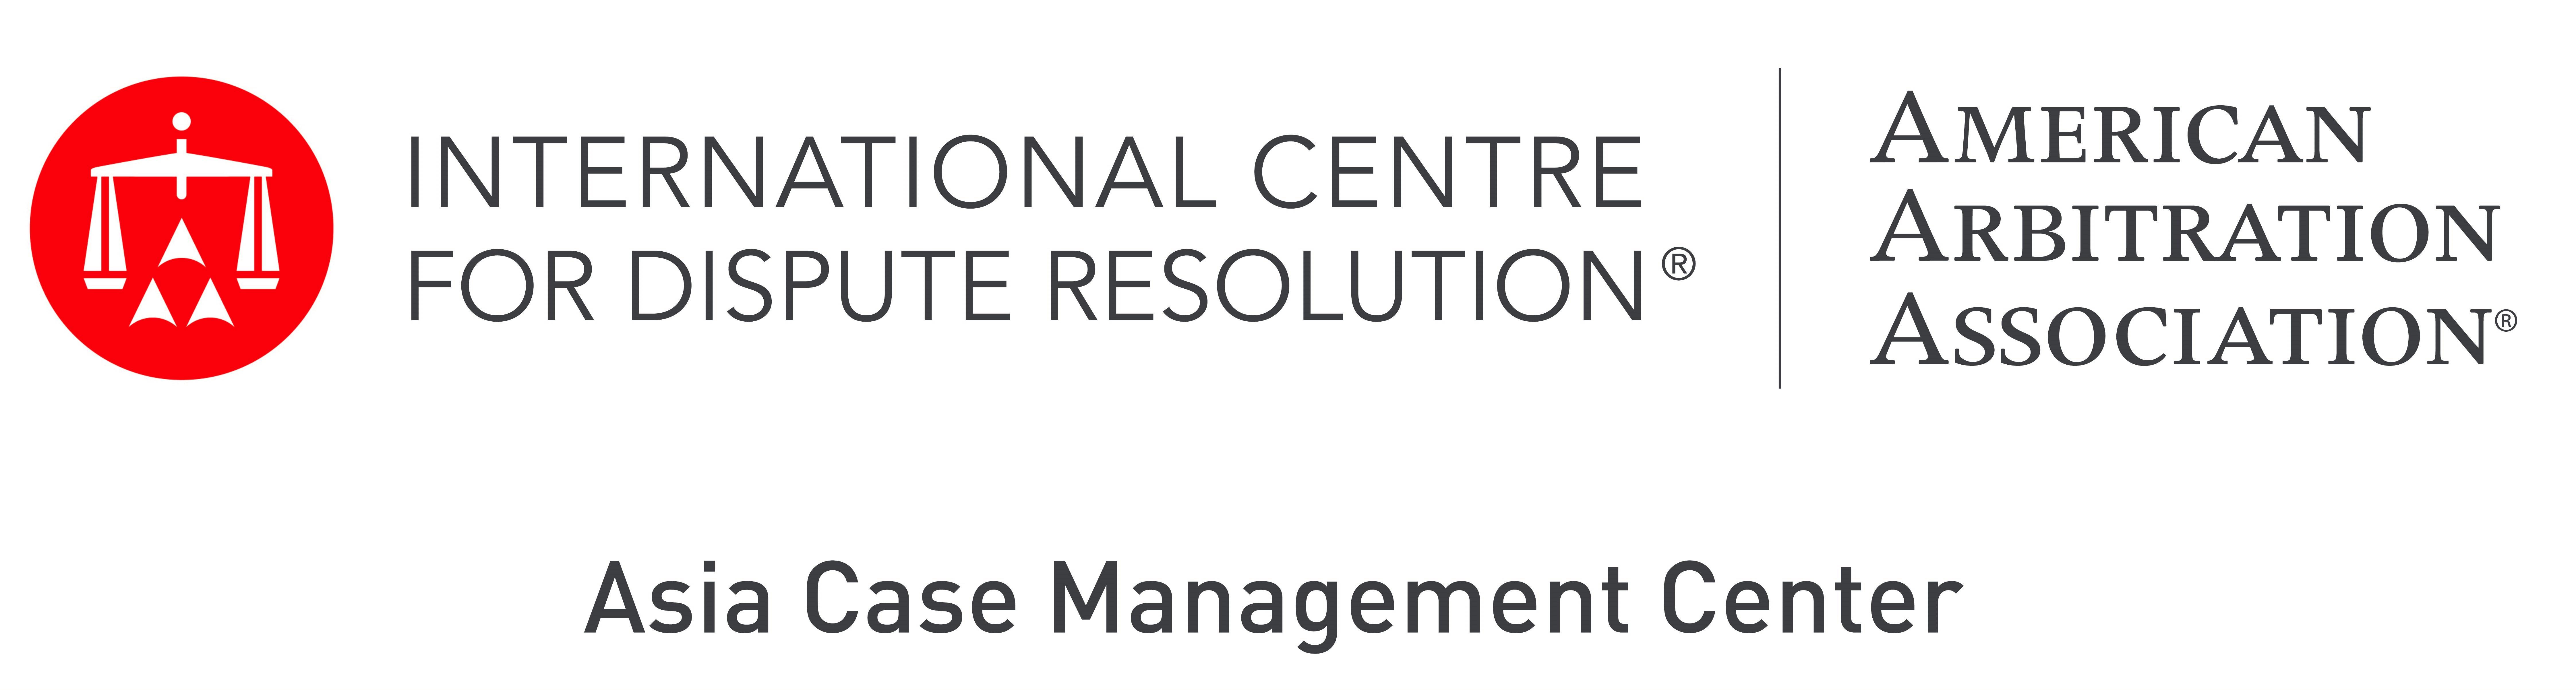 The American Arbitration Association- International Centre for Dispute Resolution